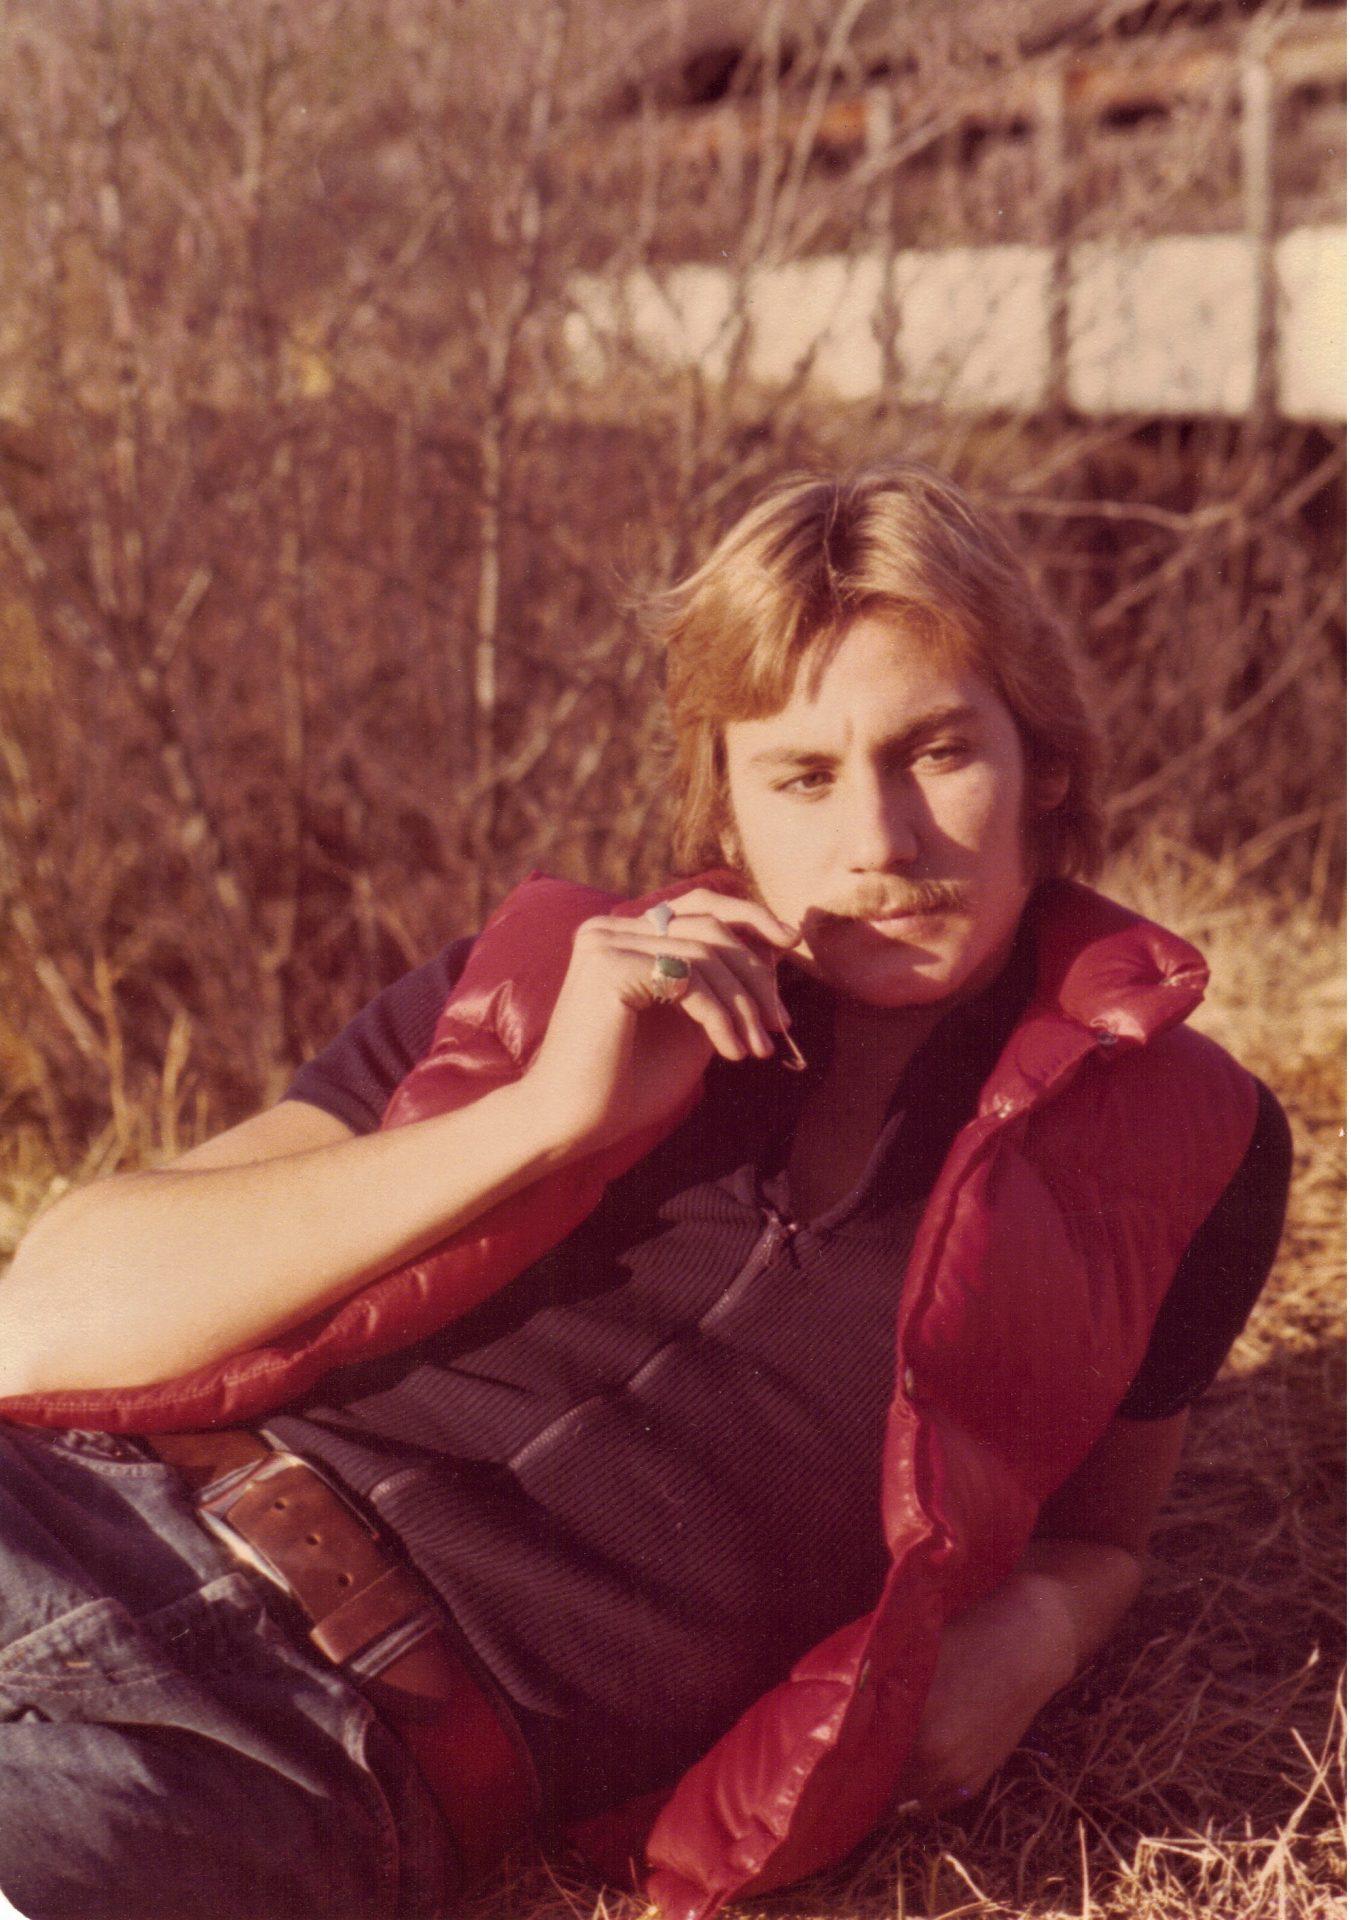 David S. Kane - College2 (1976)